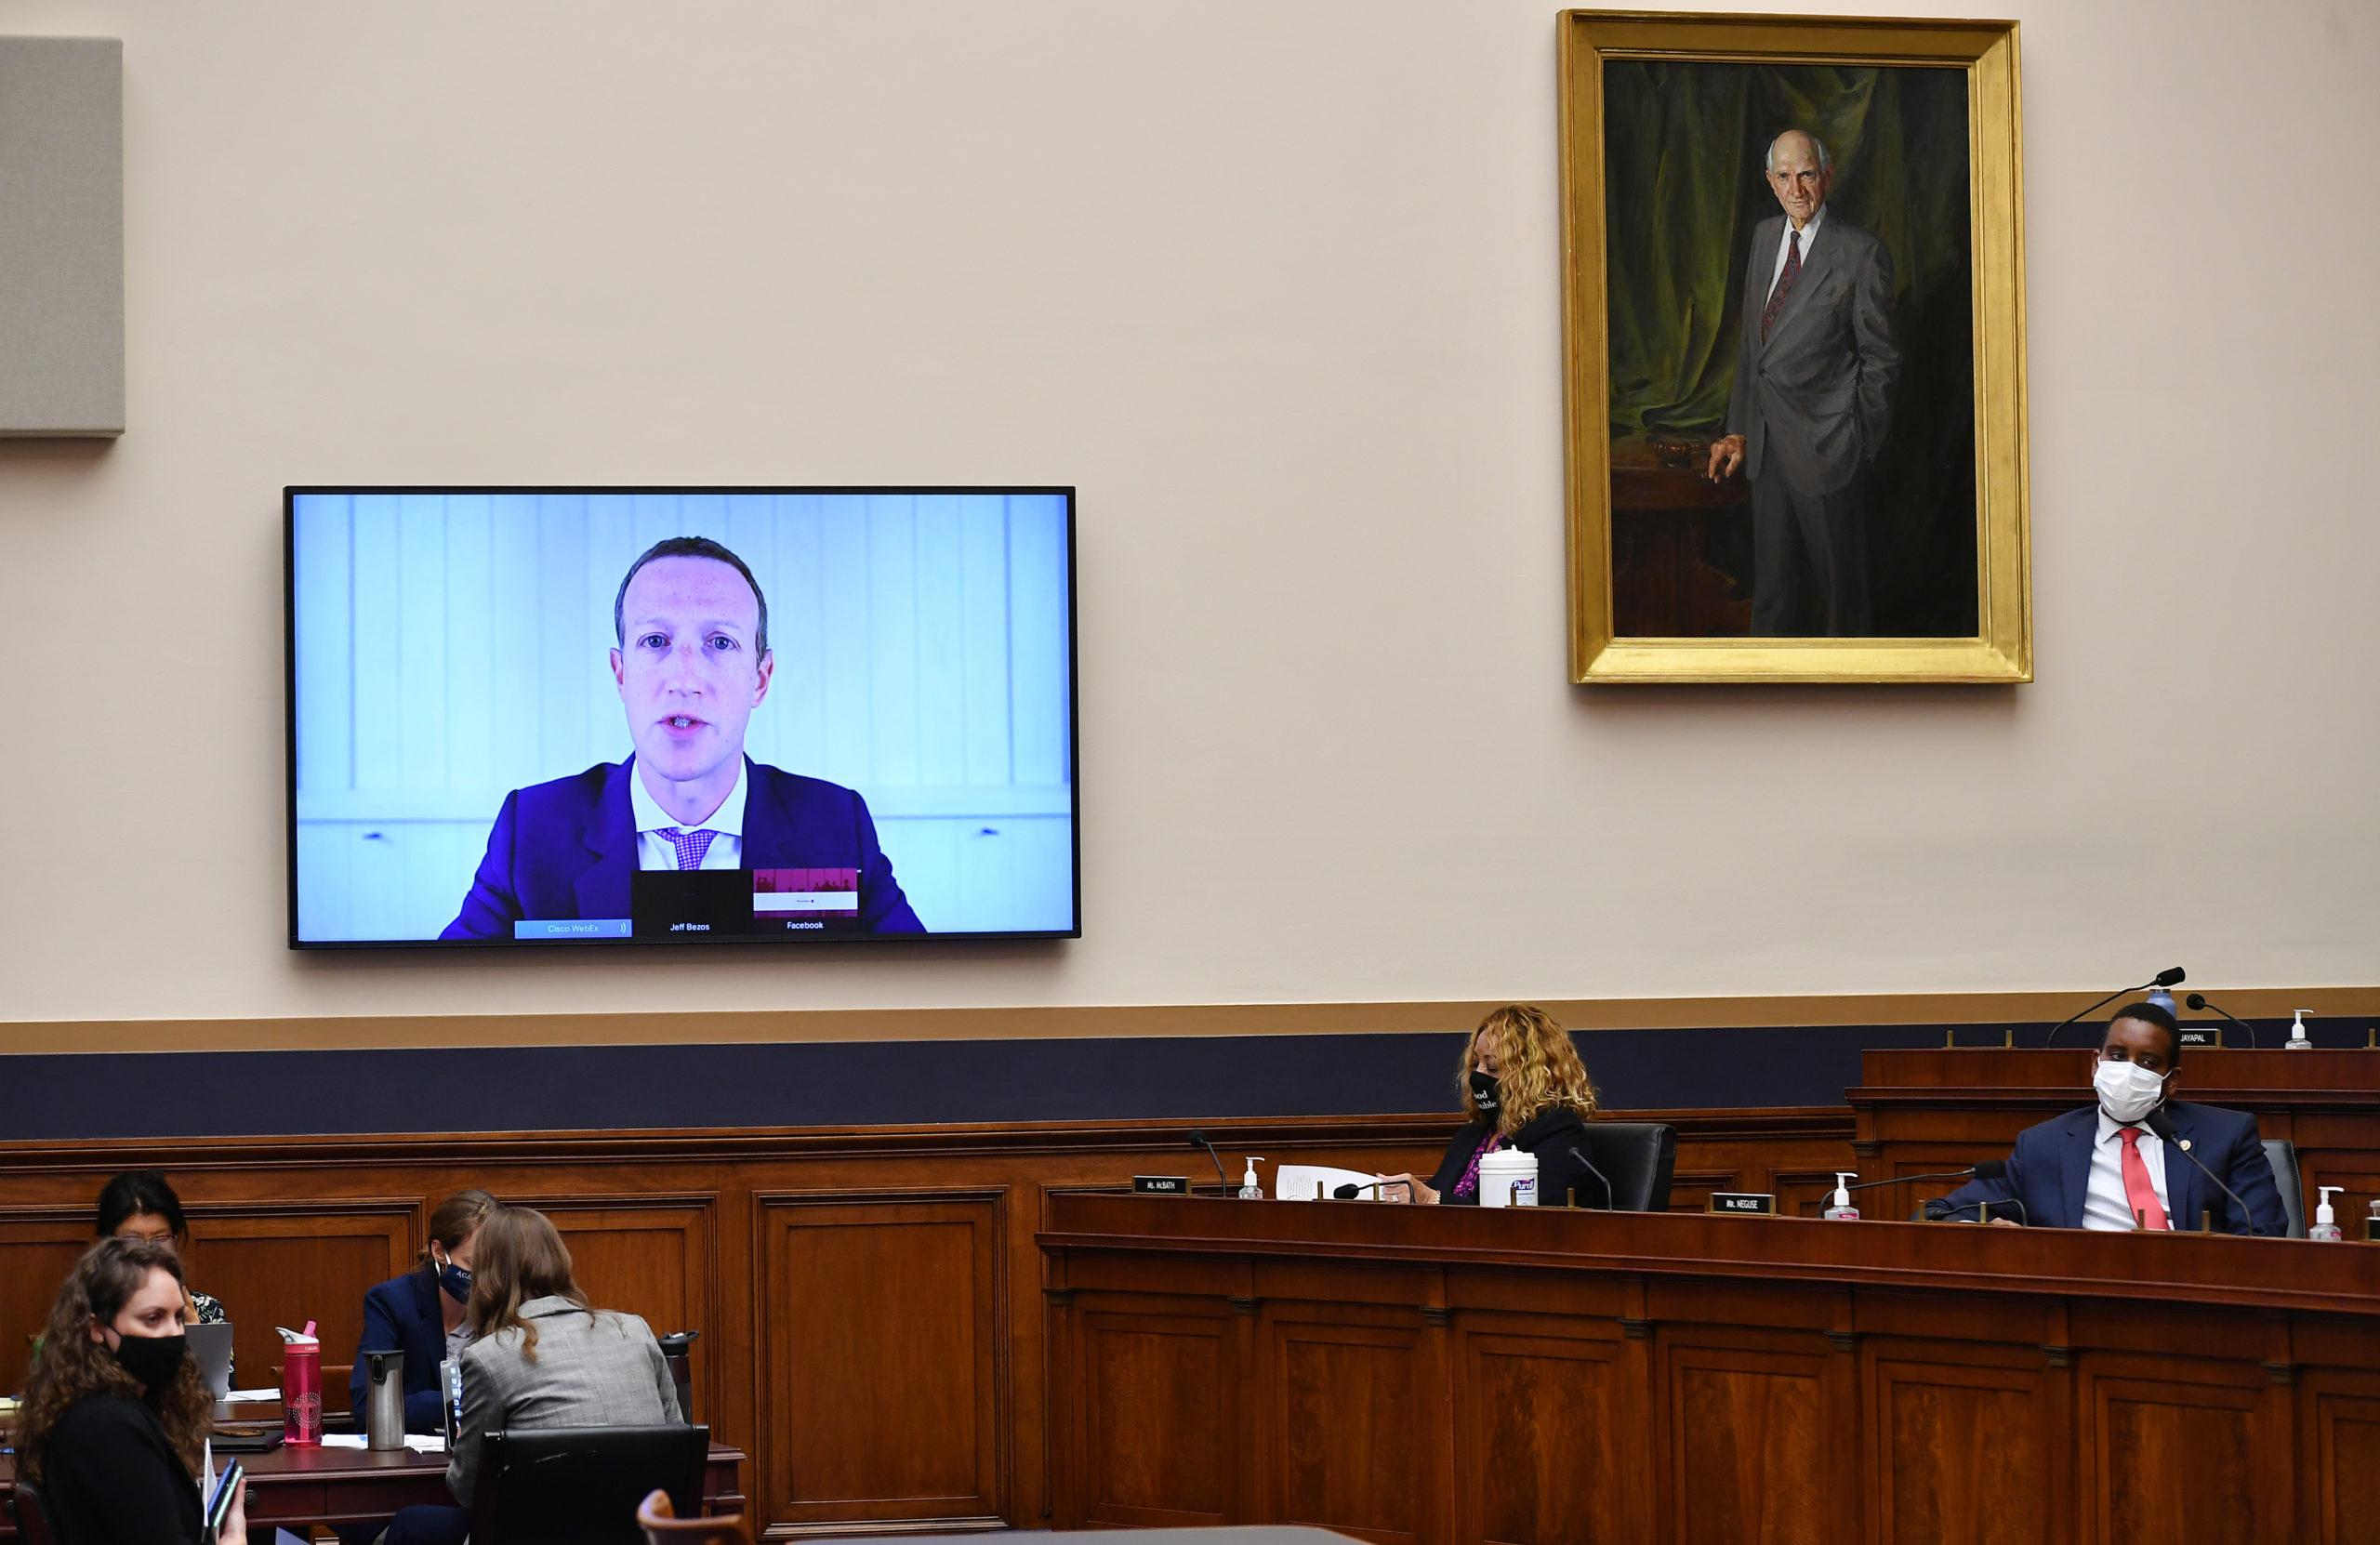 Facebook CEO Mark Zuckerberg testifies before the House Judiciary Committee July 29. (Mandel Ngan-Pool/Getty Images)